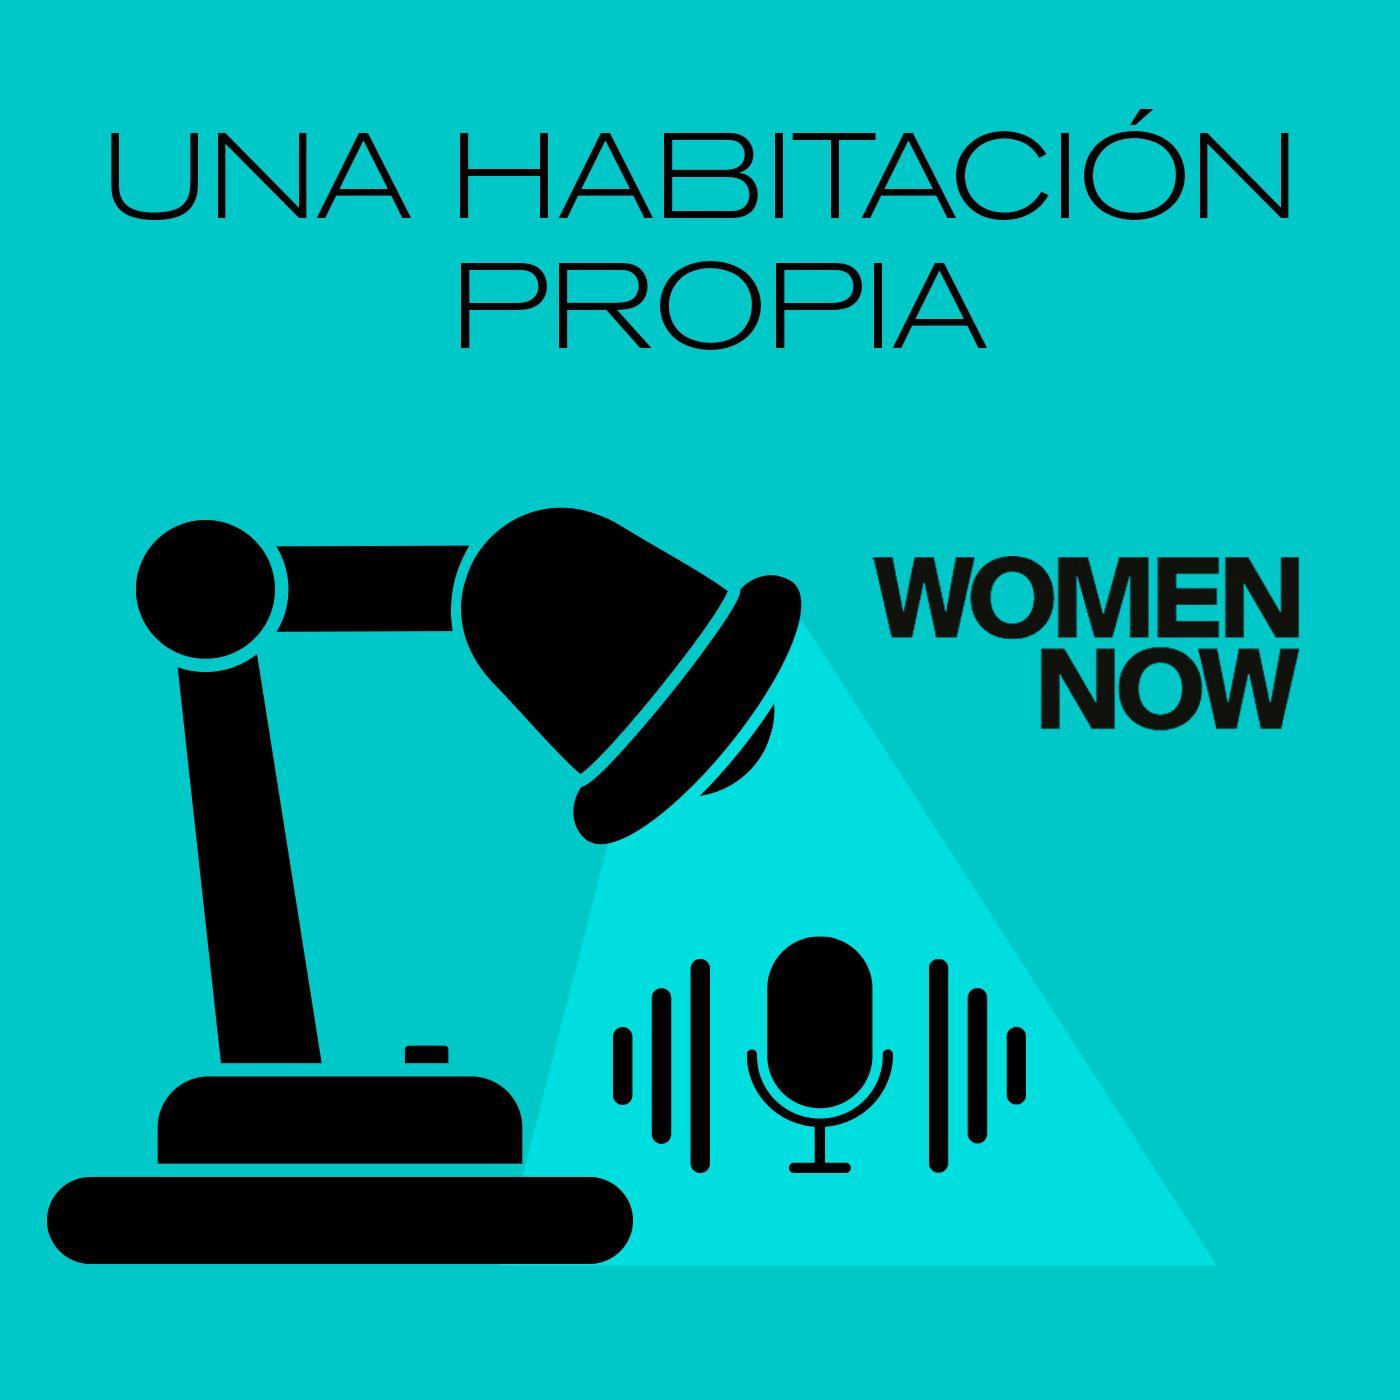 Gloria Steinem, la feminista más famosa del mundo